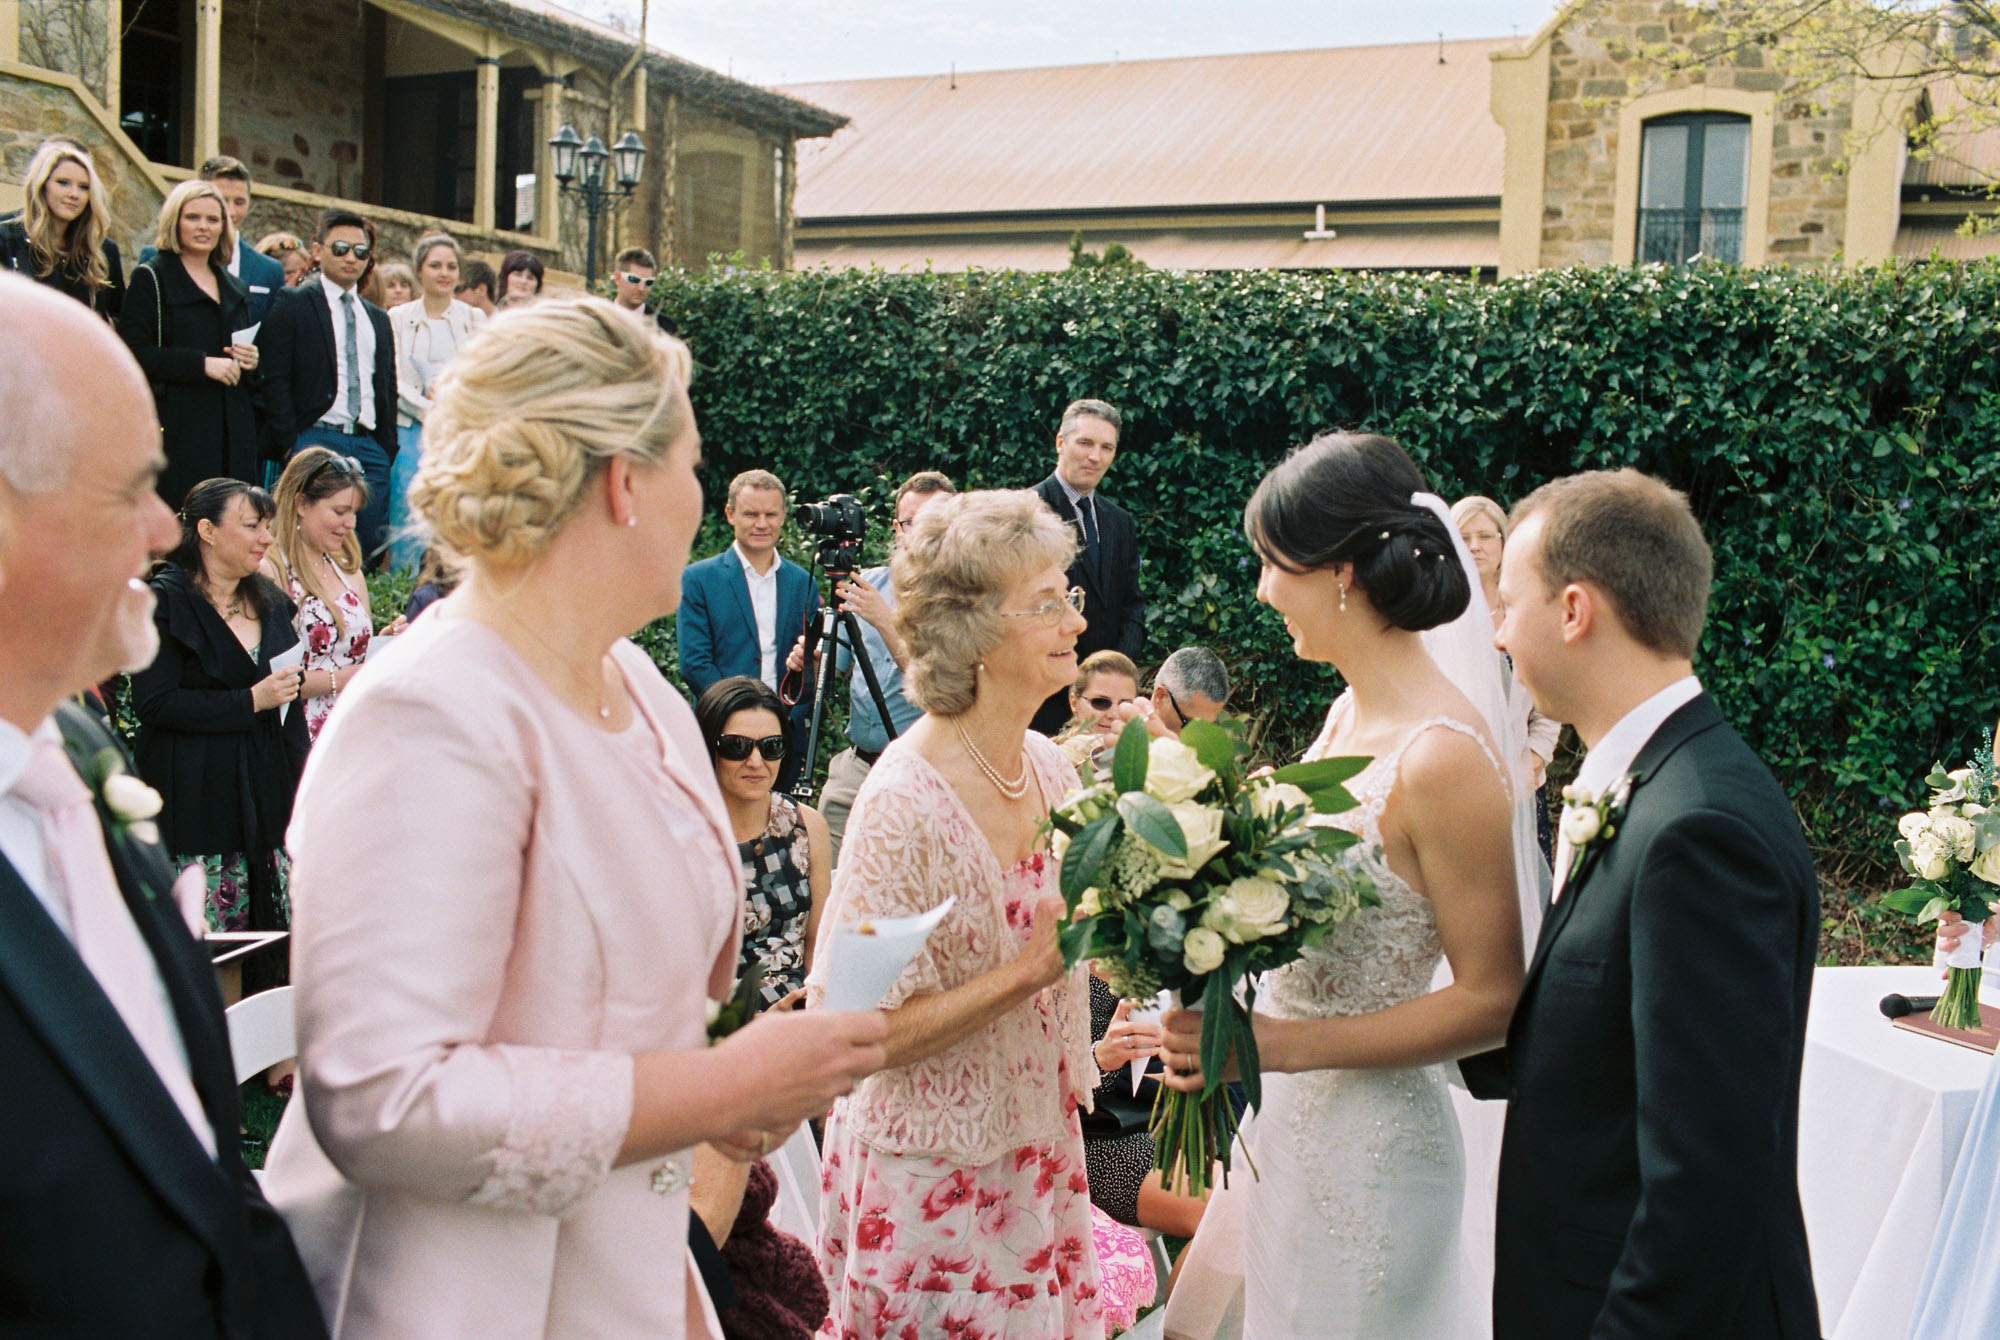 Mount-Lofty-House-wedding-photography-055.jpg